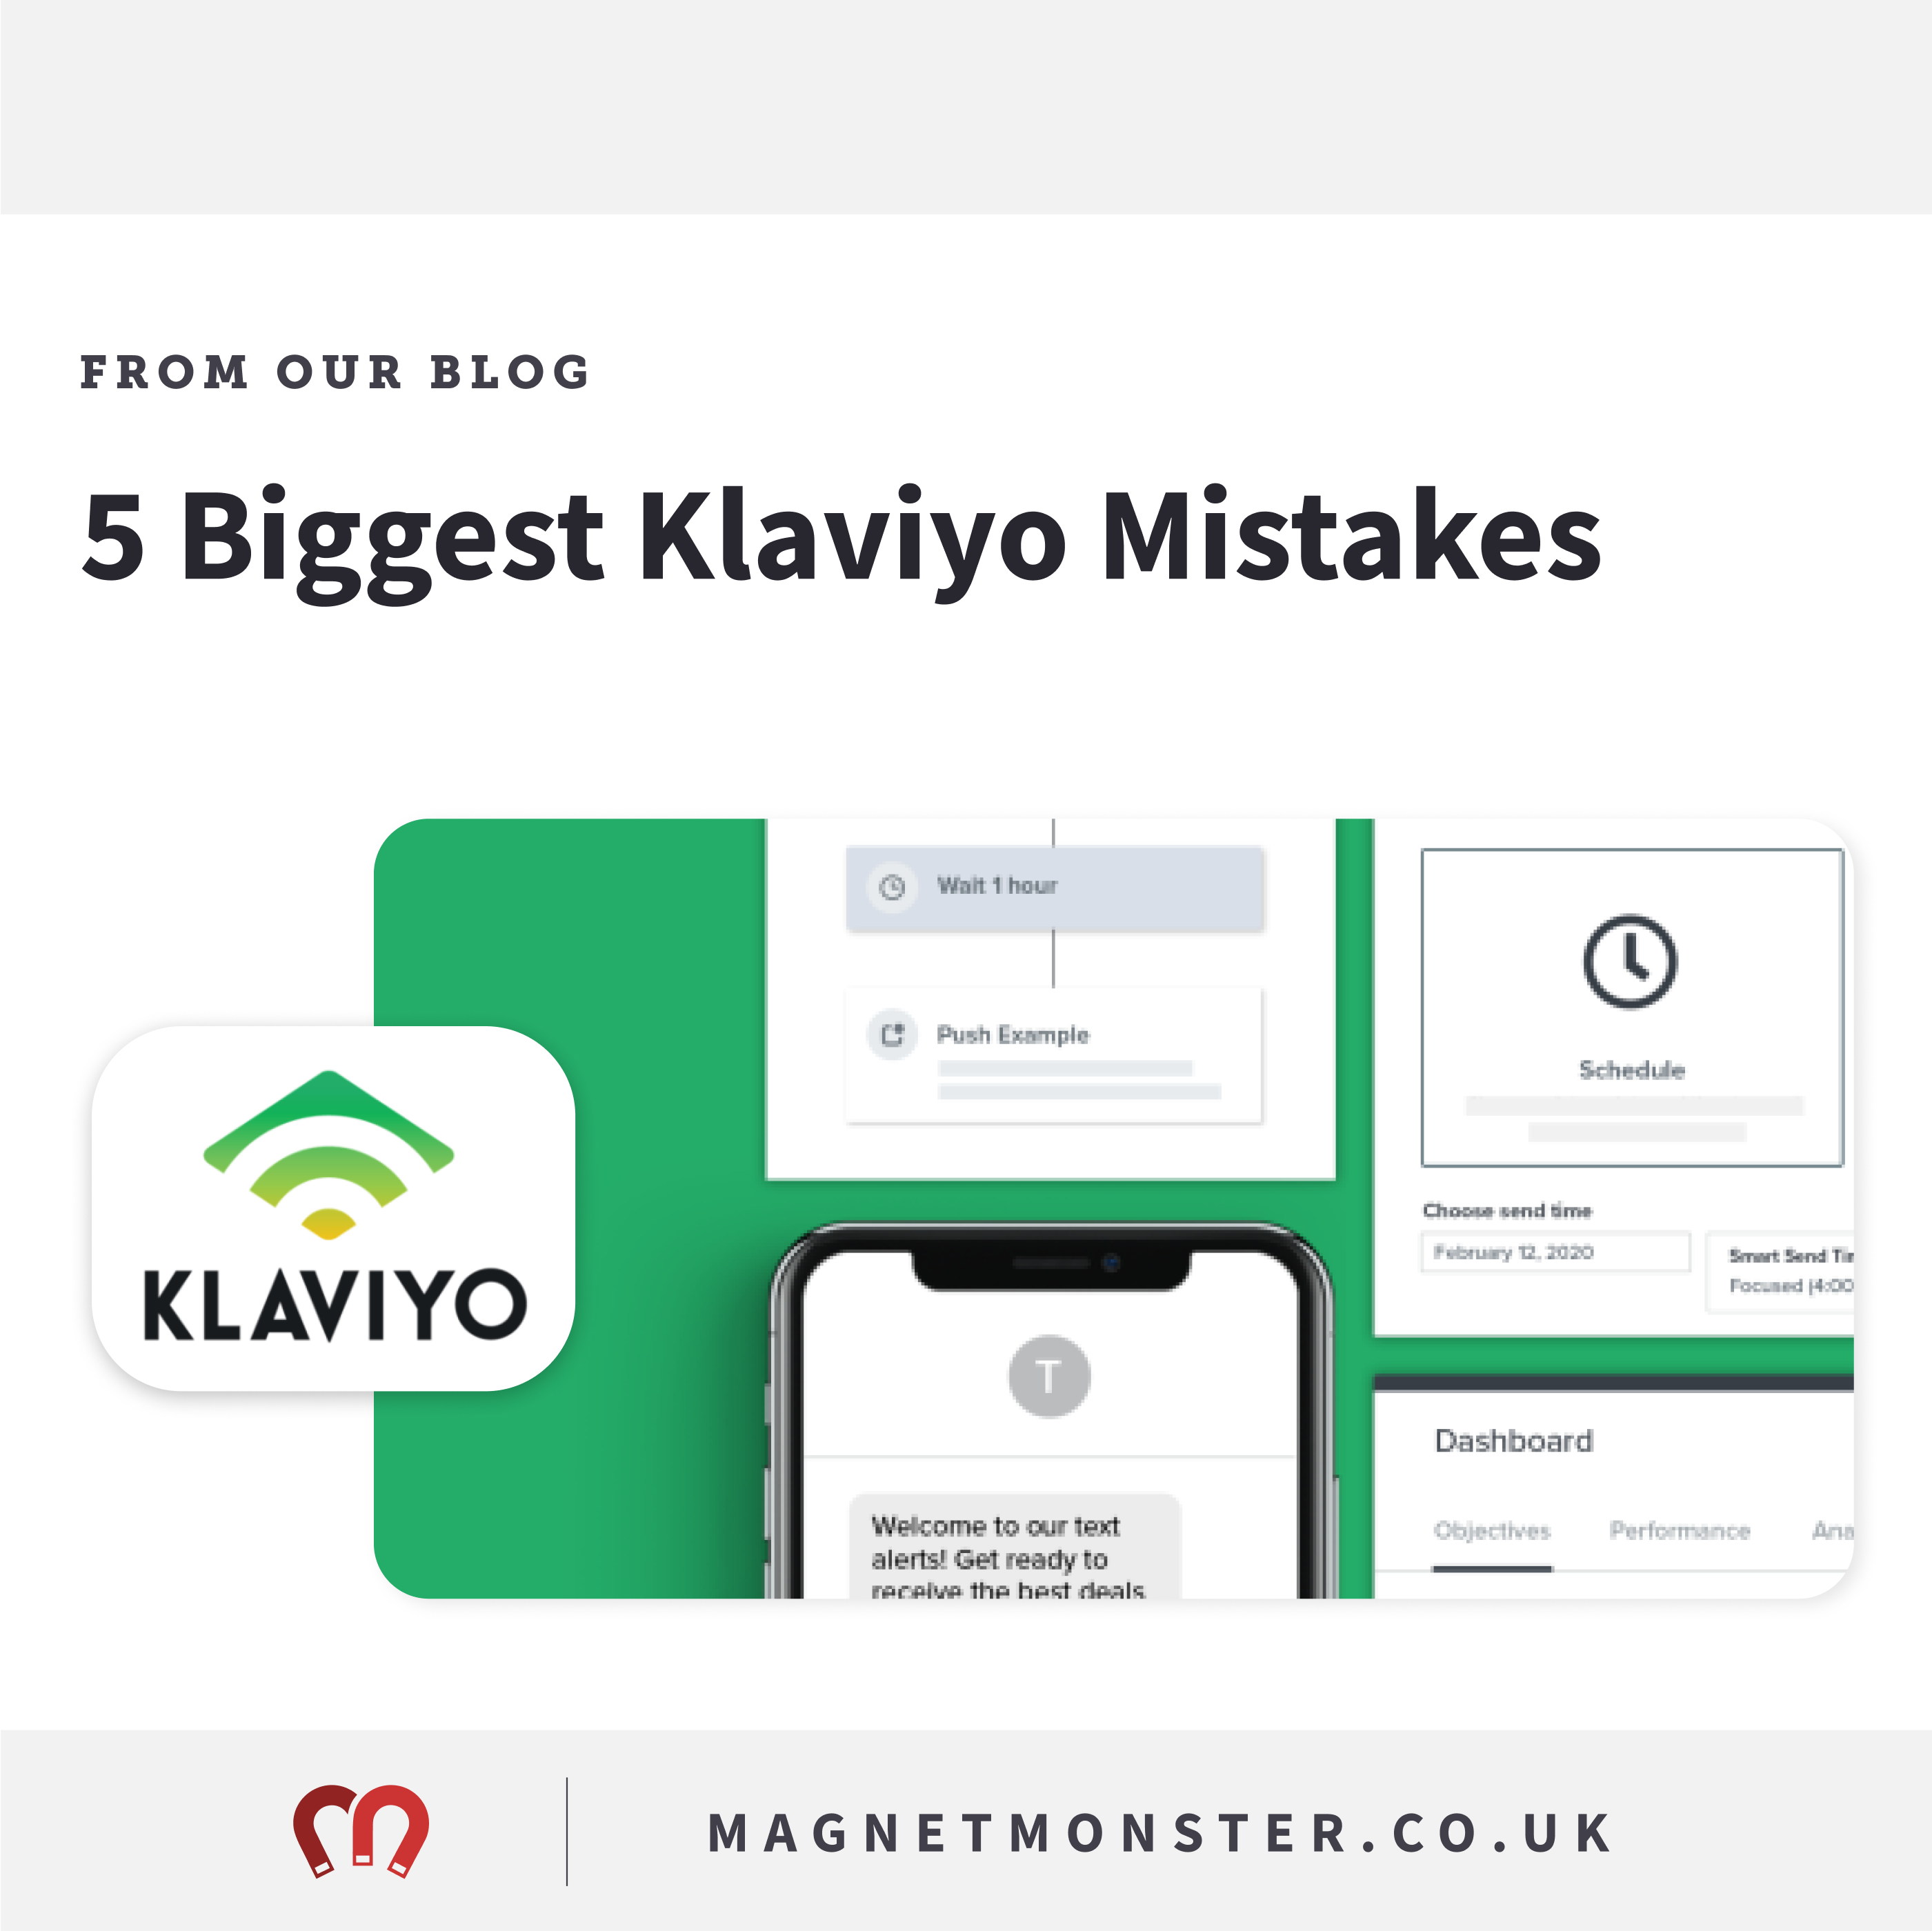 5 Big Klaviyo Mistakes